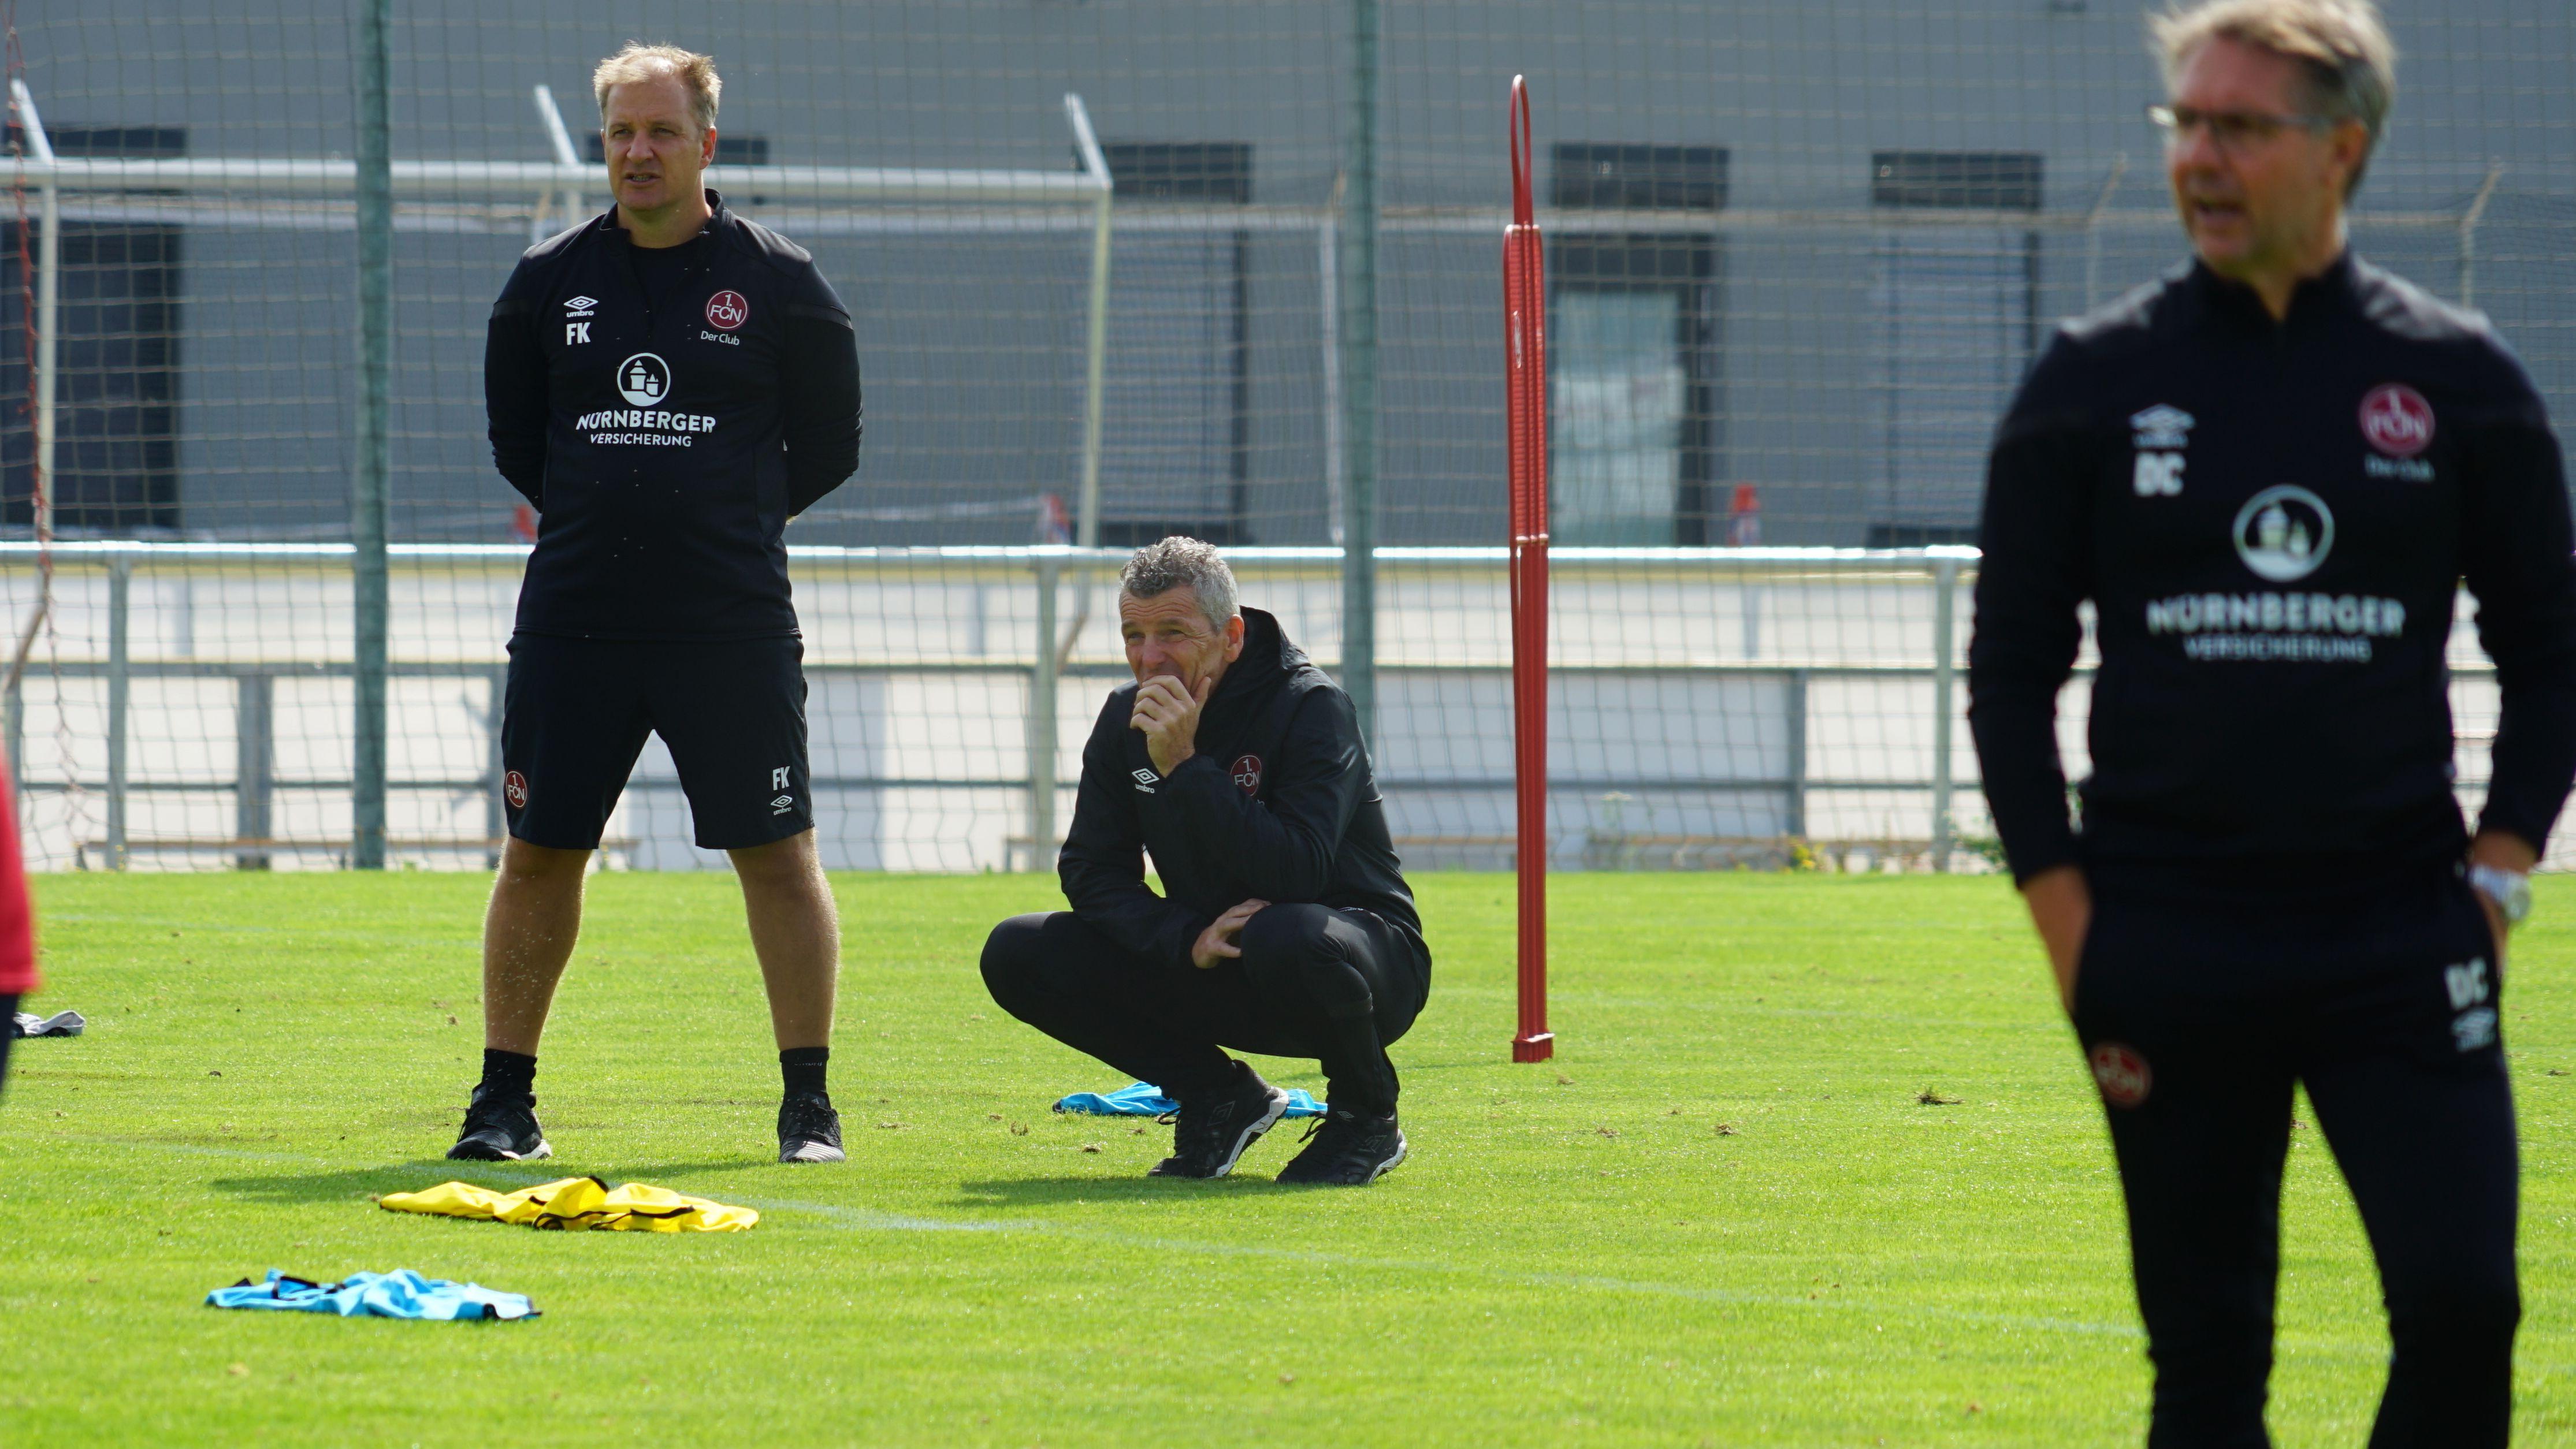 Mathias Berthold (Mitte) bei einem Training des 1. FC Nürnberg